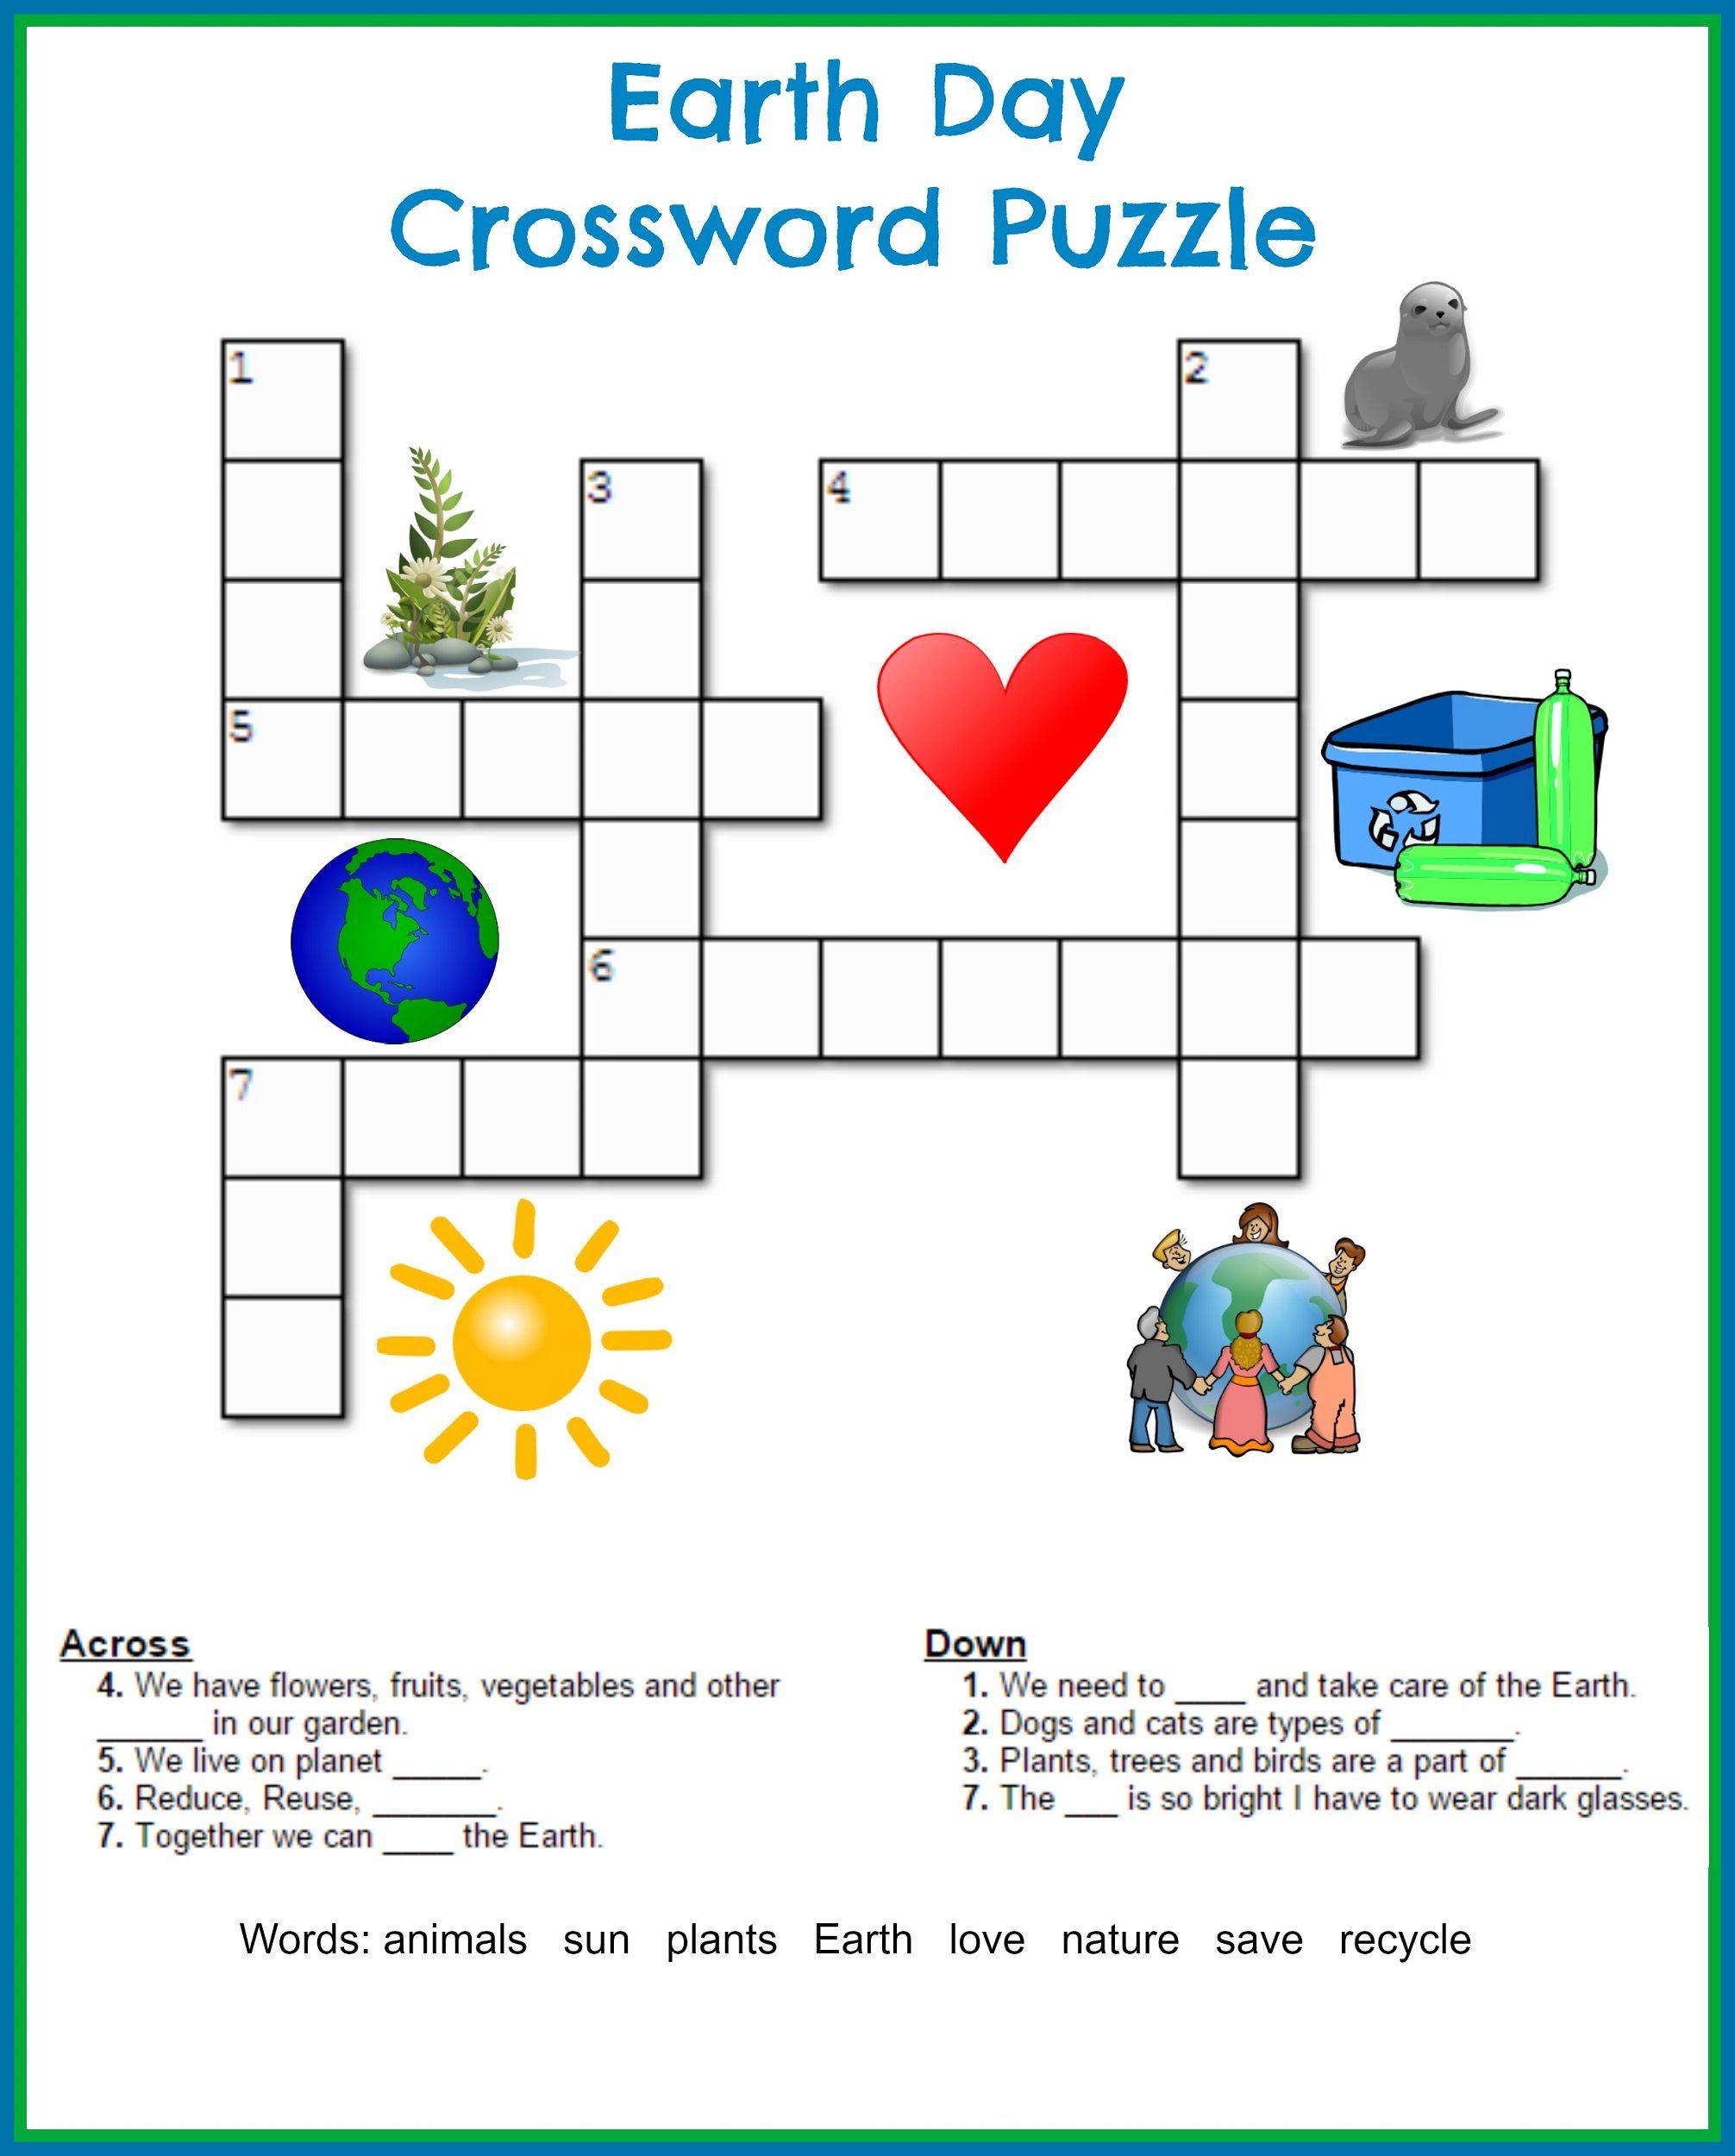 Printable Crossword Puzzles Kids | Crossword Puzzles On Earth - Printable Crossword Puzzles For Preschoolers